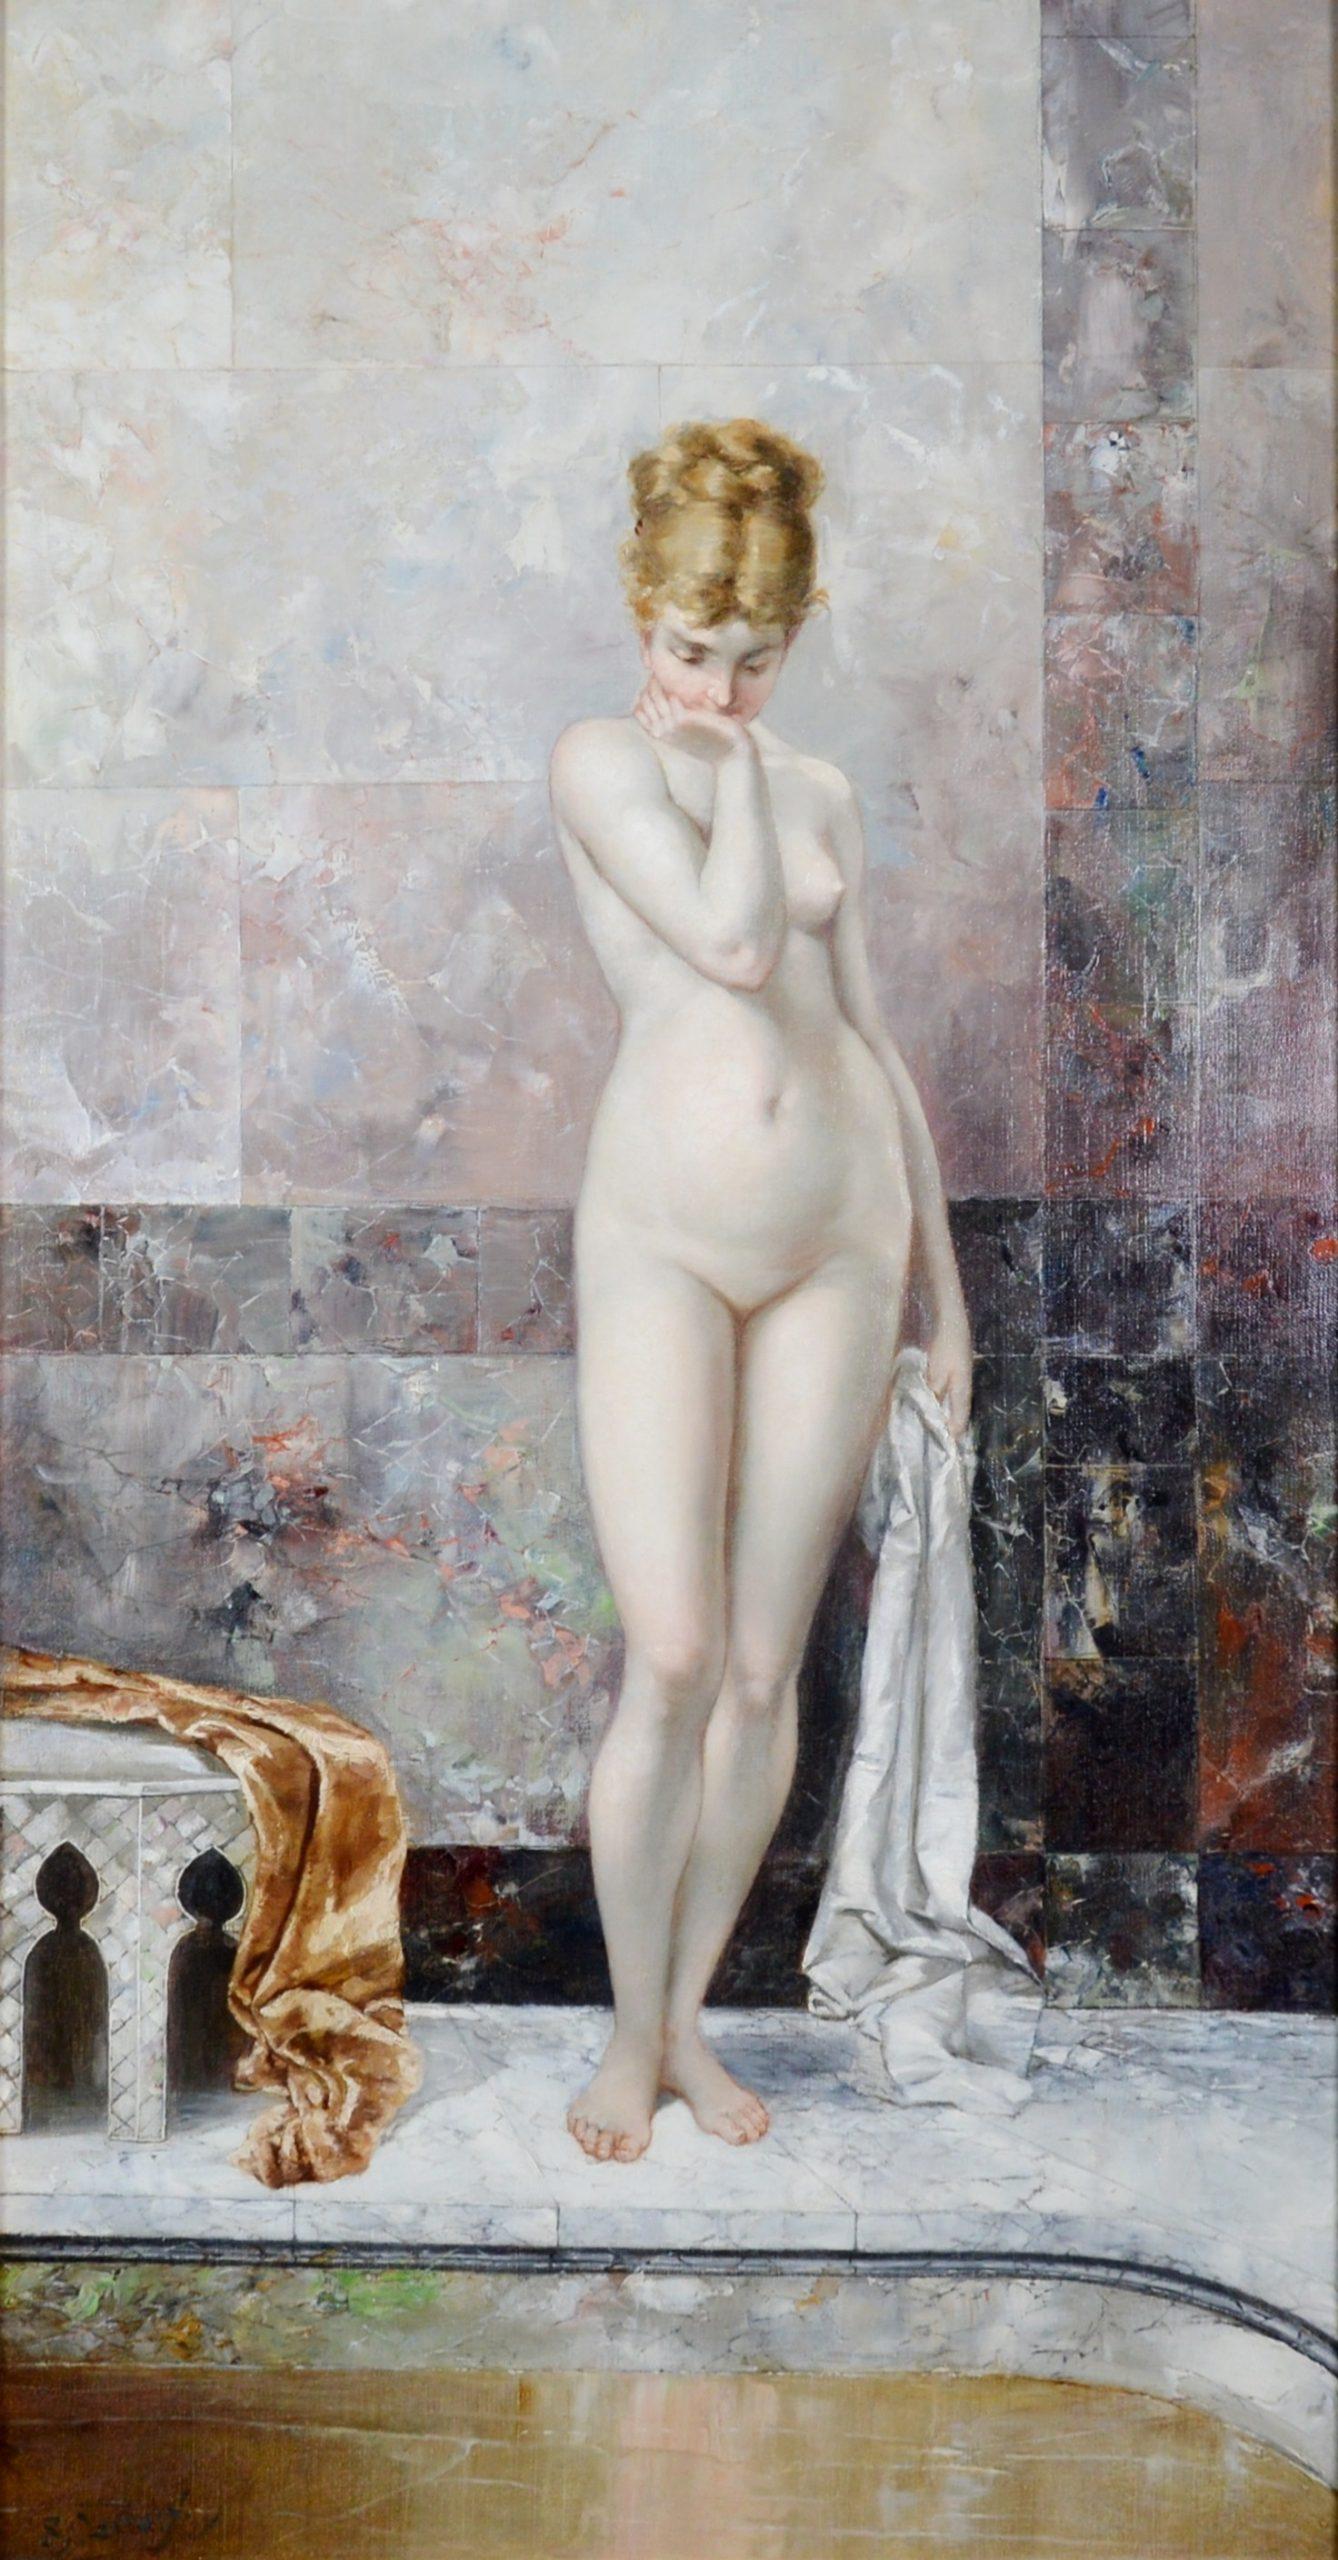 Apprehension - Large 19th Century Orientalist Nude Portrait Oil Painting Image